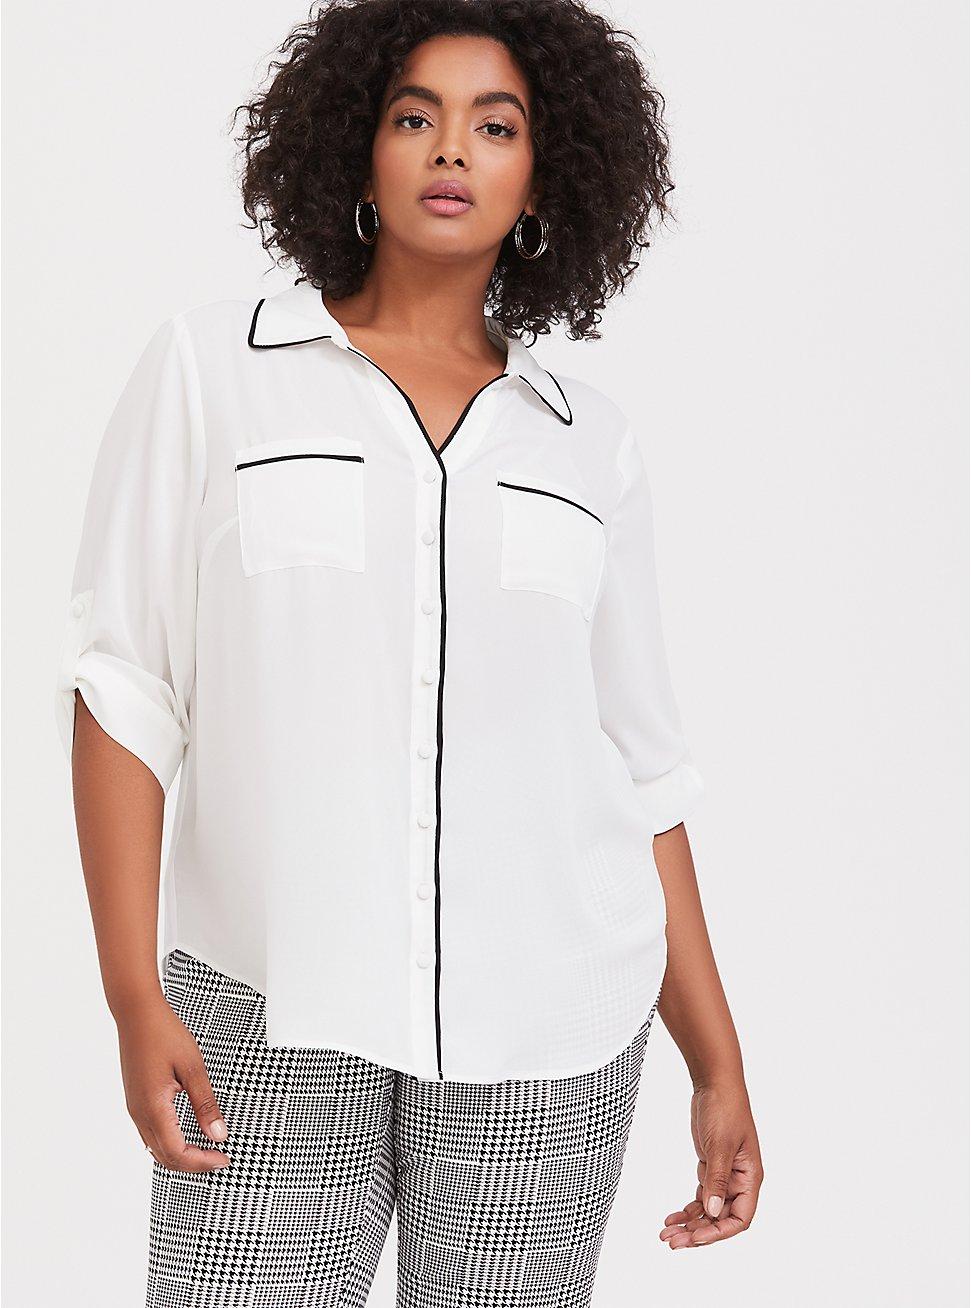 Plus Size Madison - White & Black Piped Georgette Button Front Blouse, CLOUD DANCER, hi-res